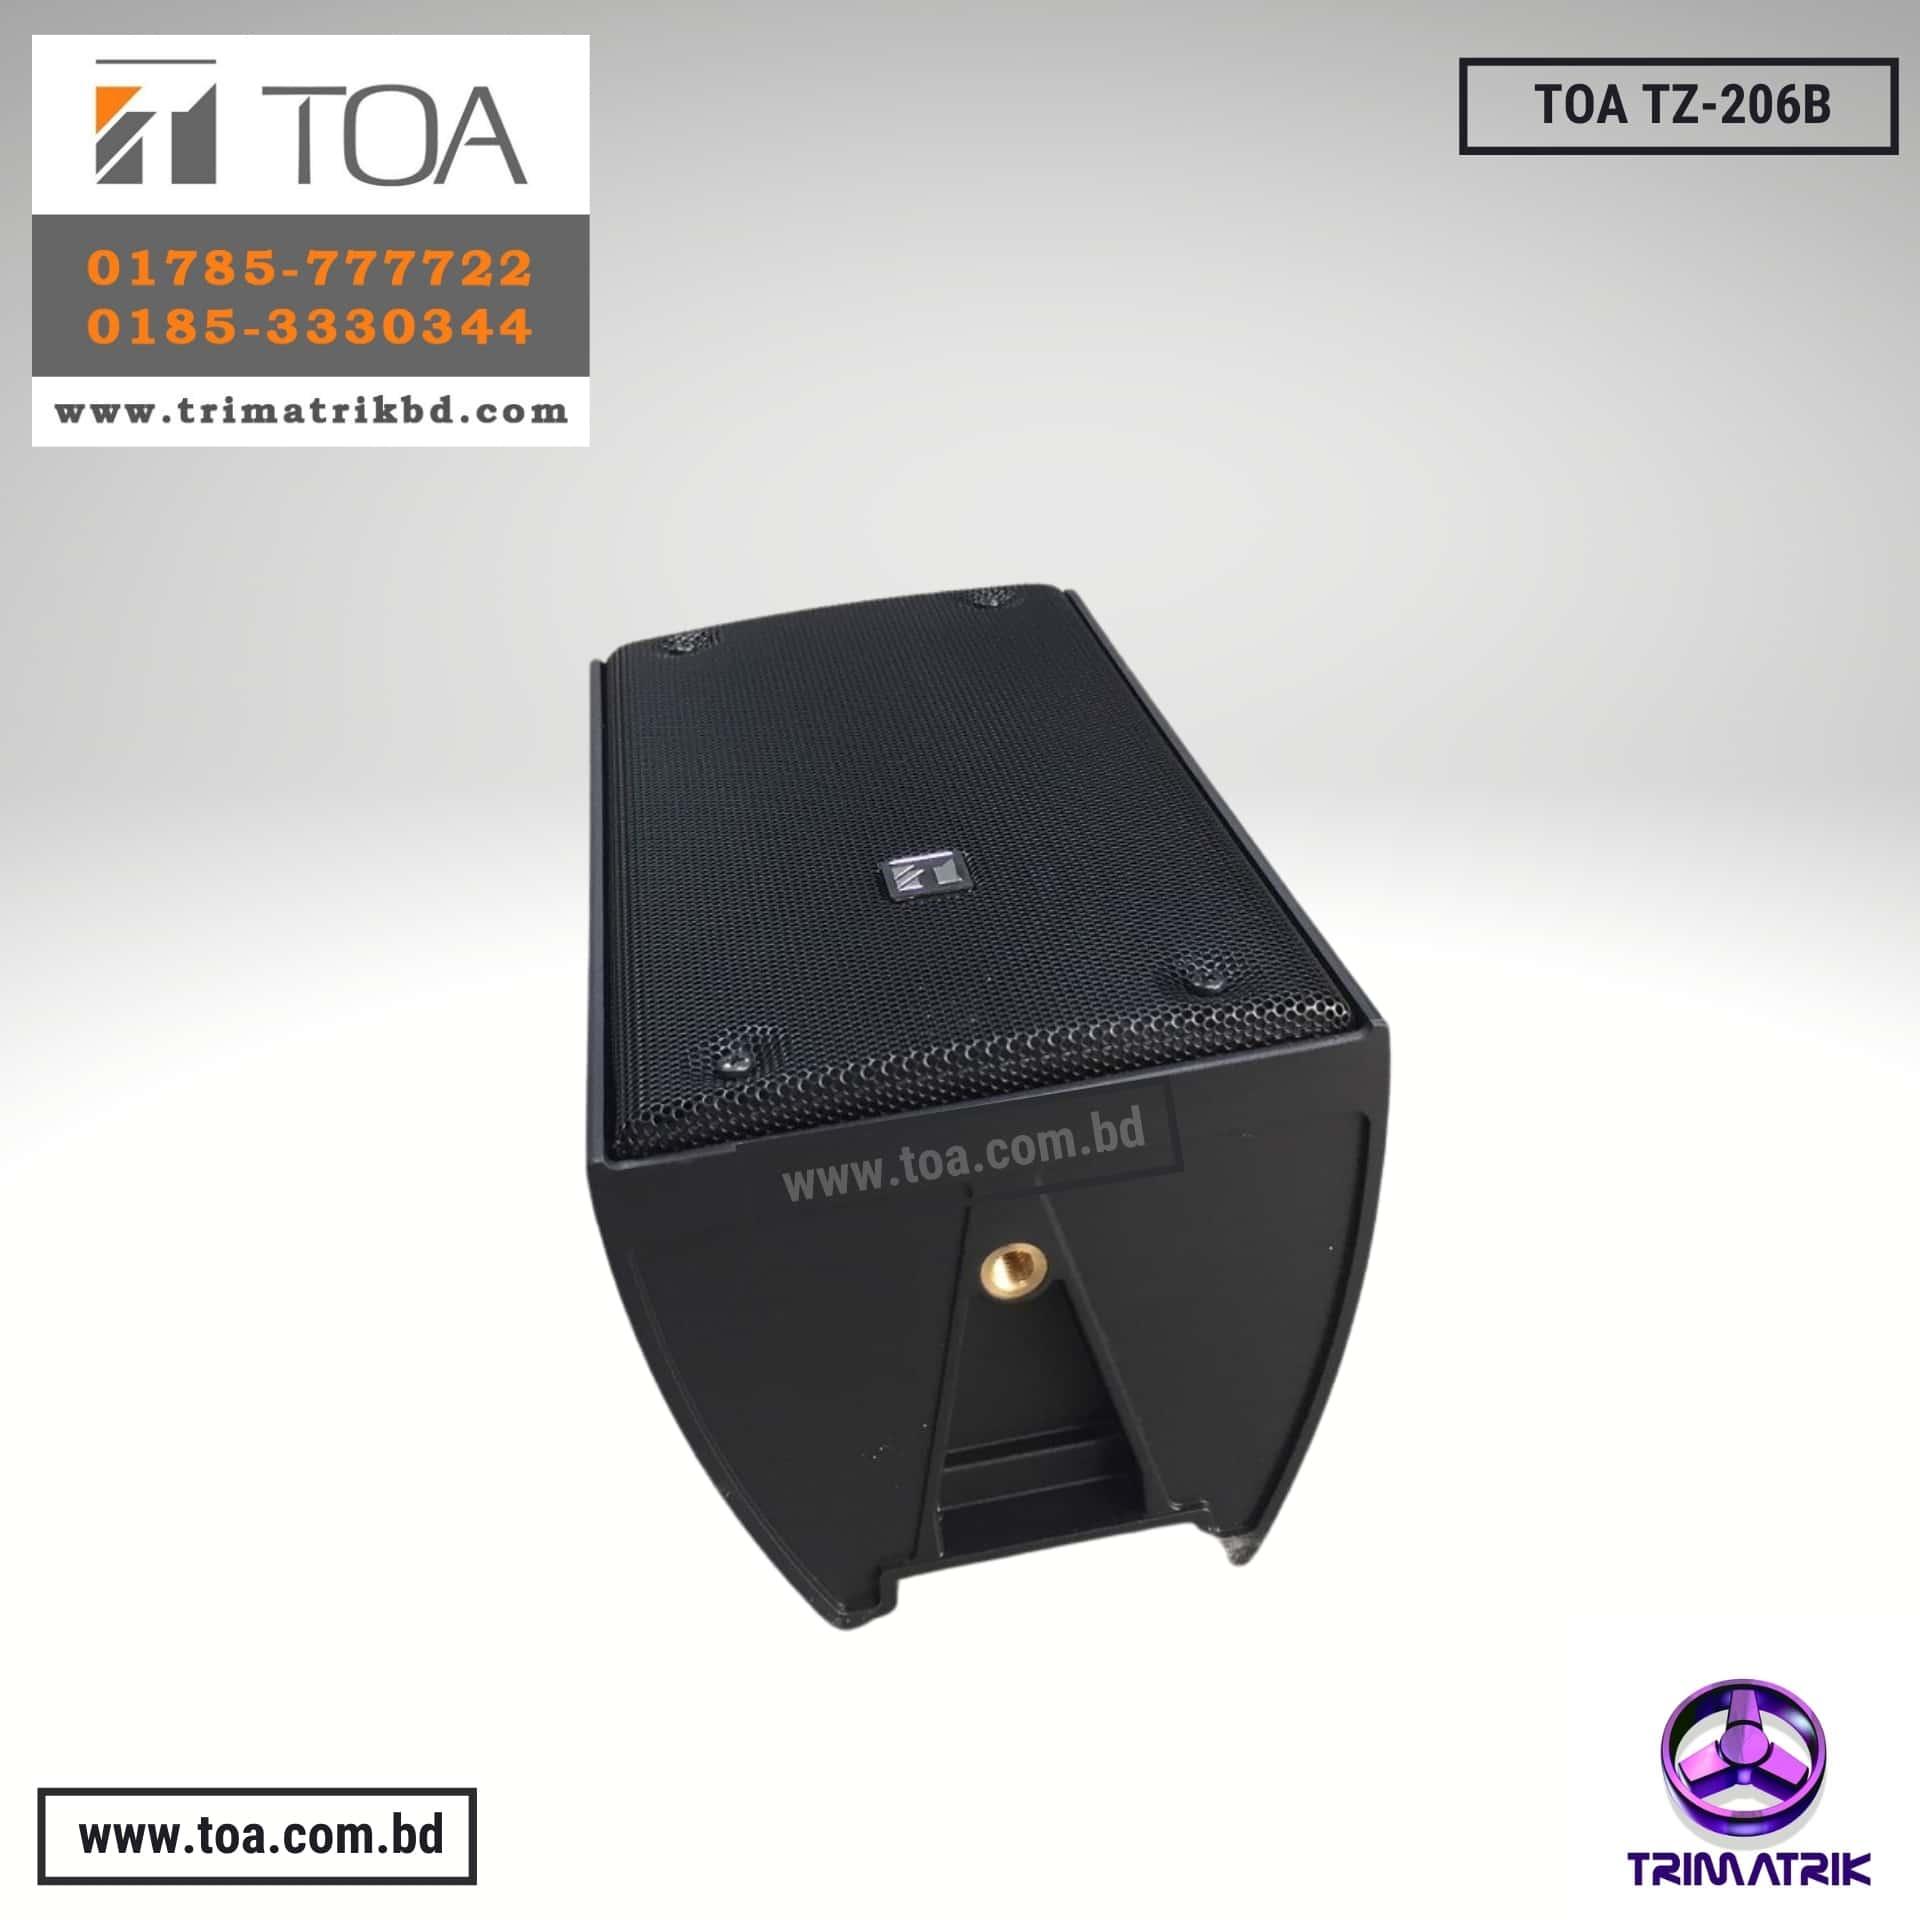 https://www.trimatrikbd.com/product/toa-tz-206-bangladesh/